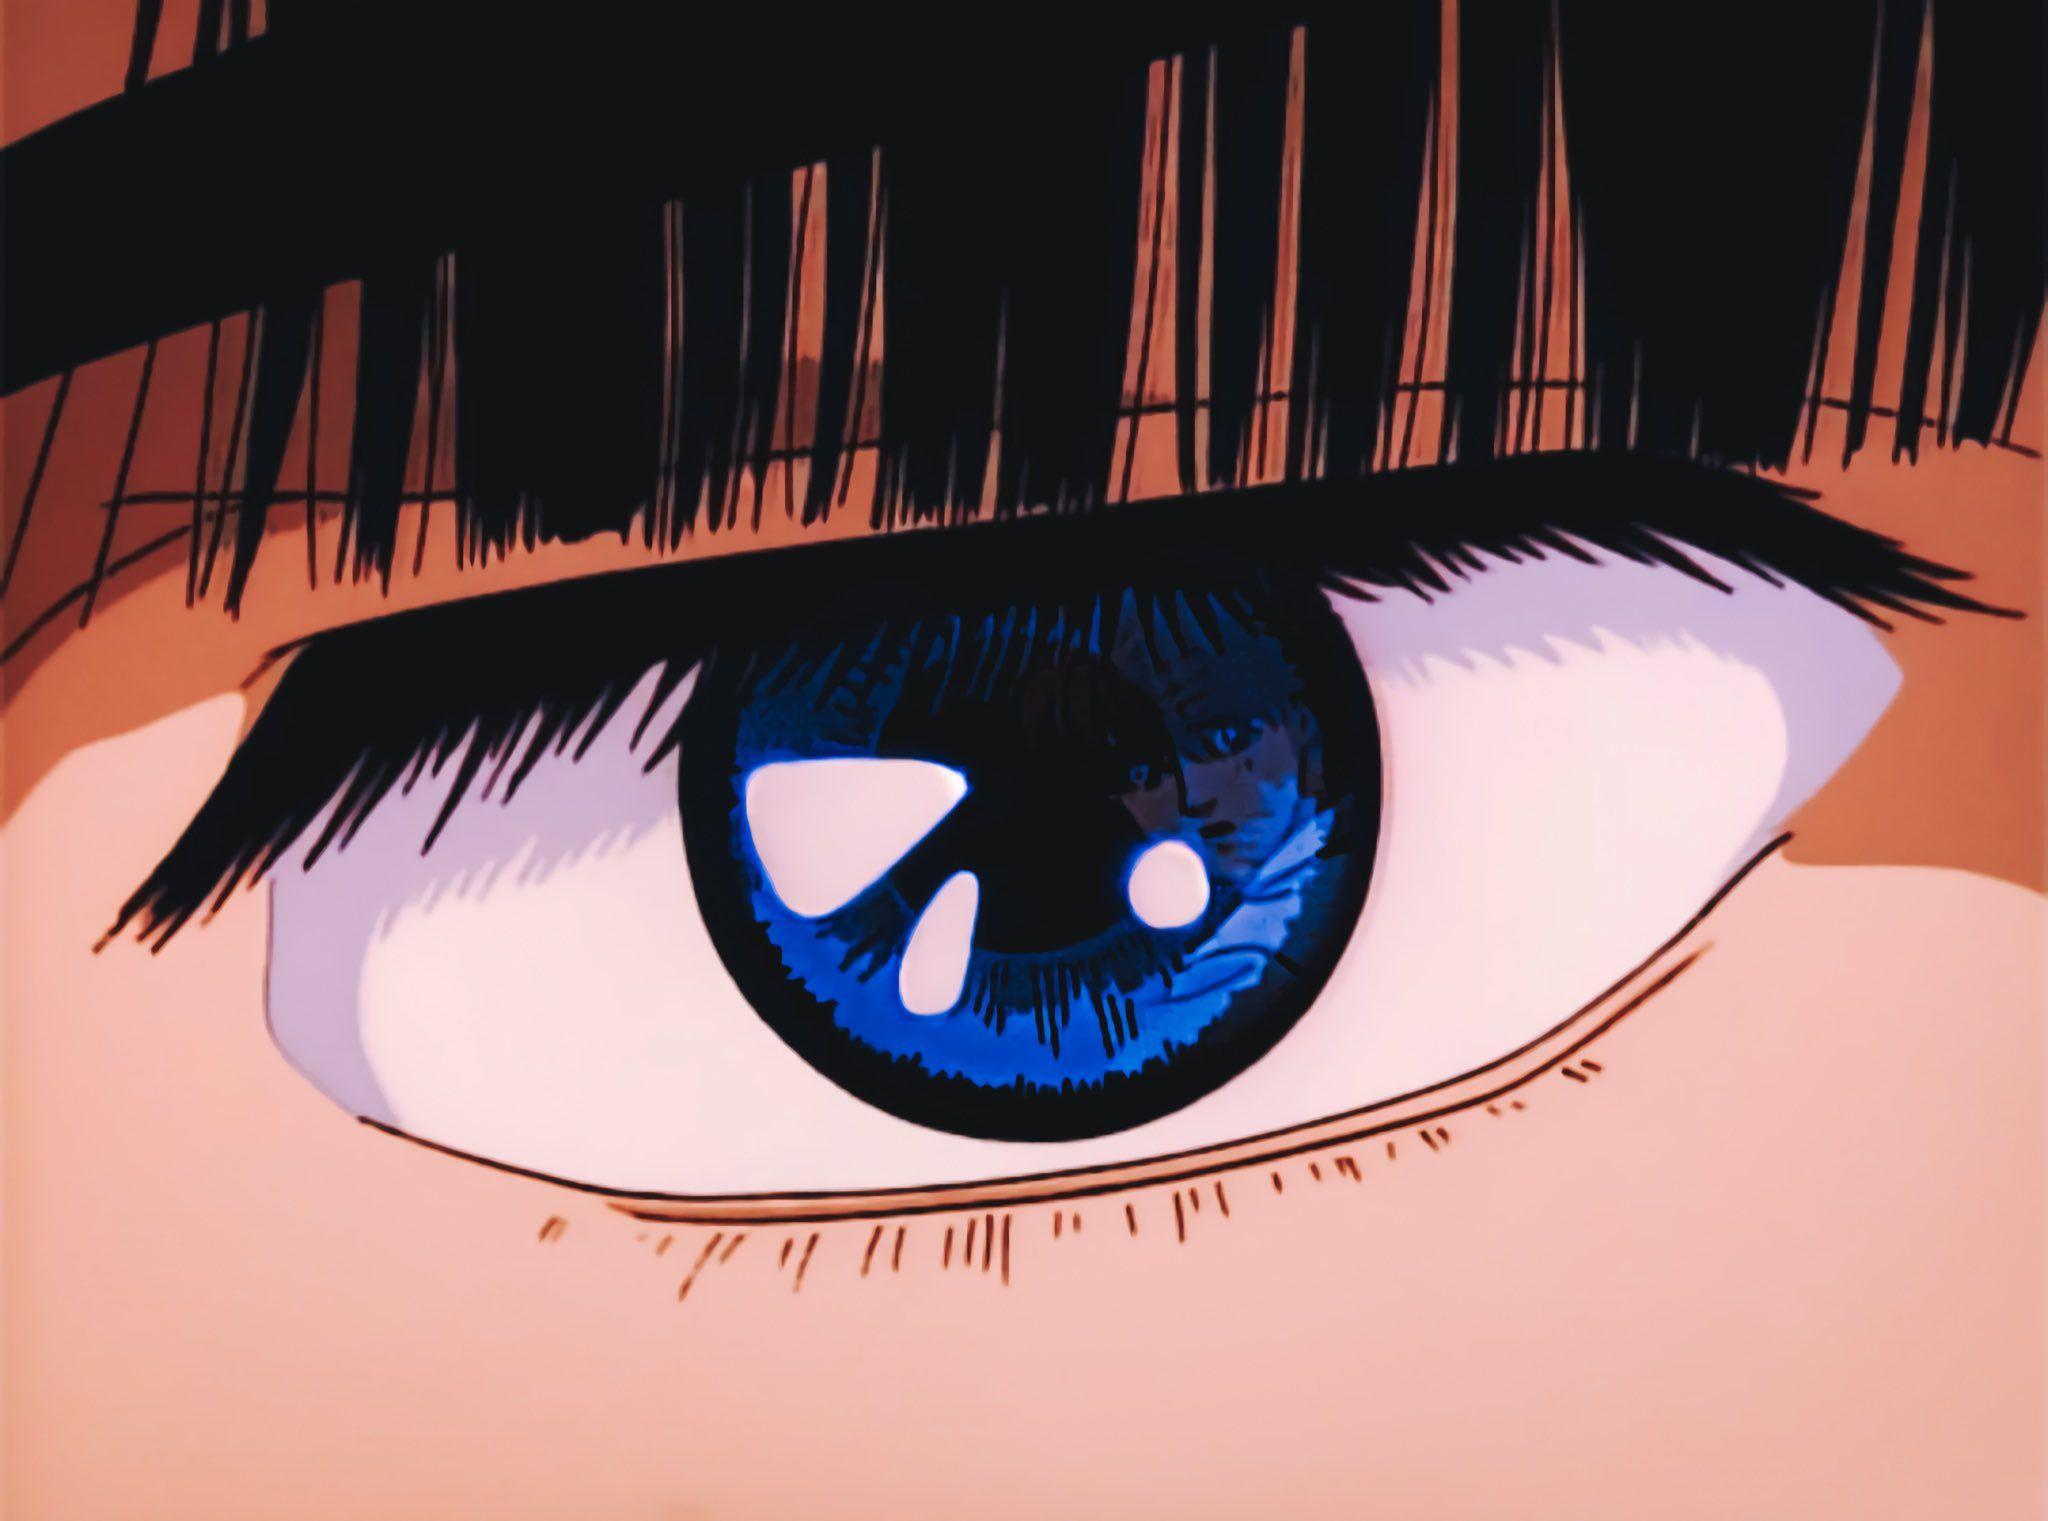 Anime Aesthetic On Twitter Anime Eyes Aesthetic Anime Anime Wall Art